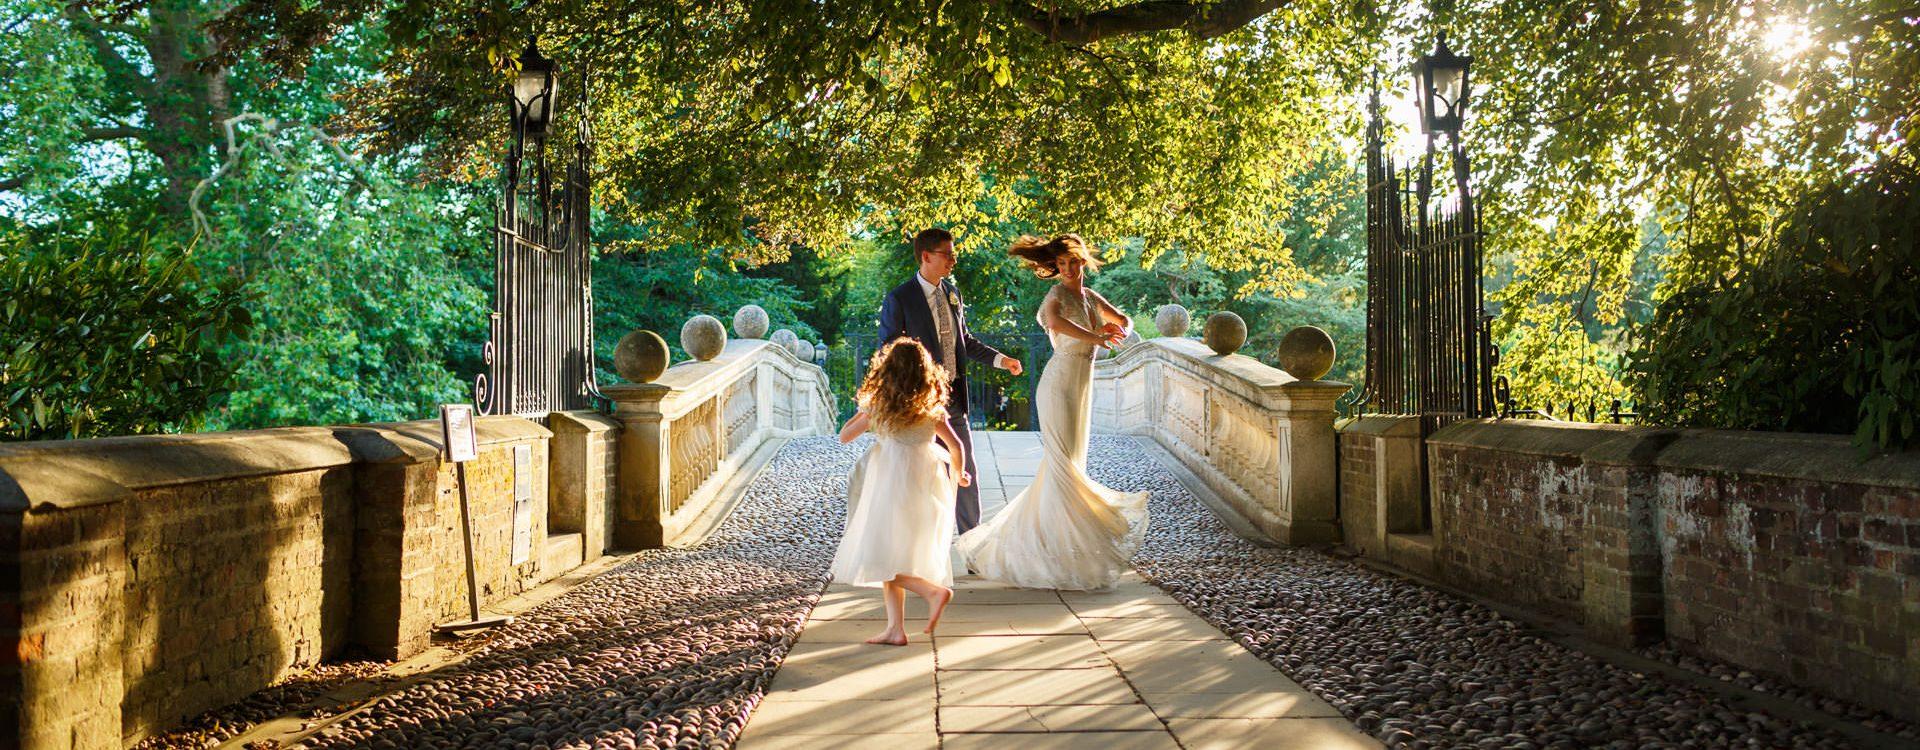 London Wedding Photographer 4